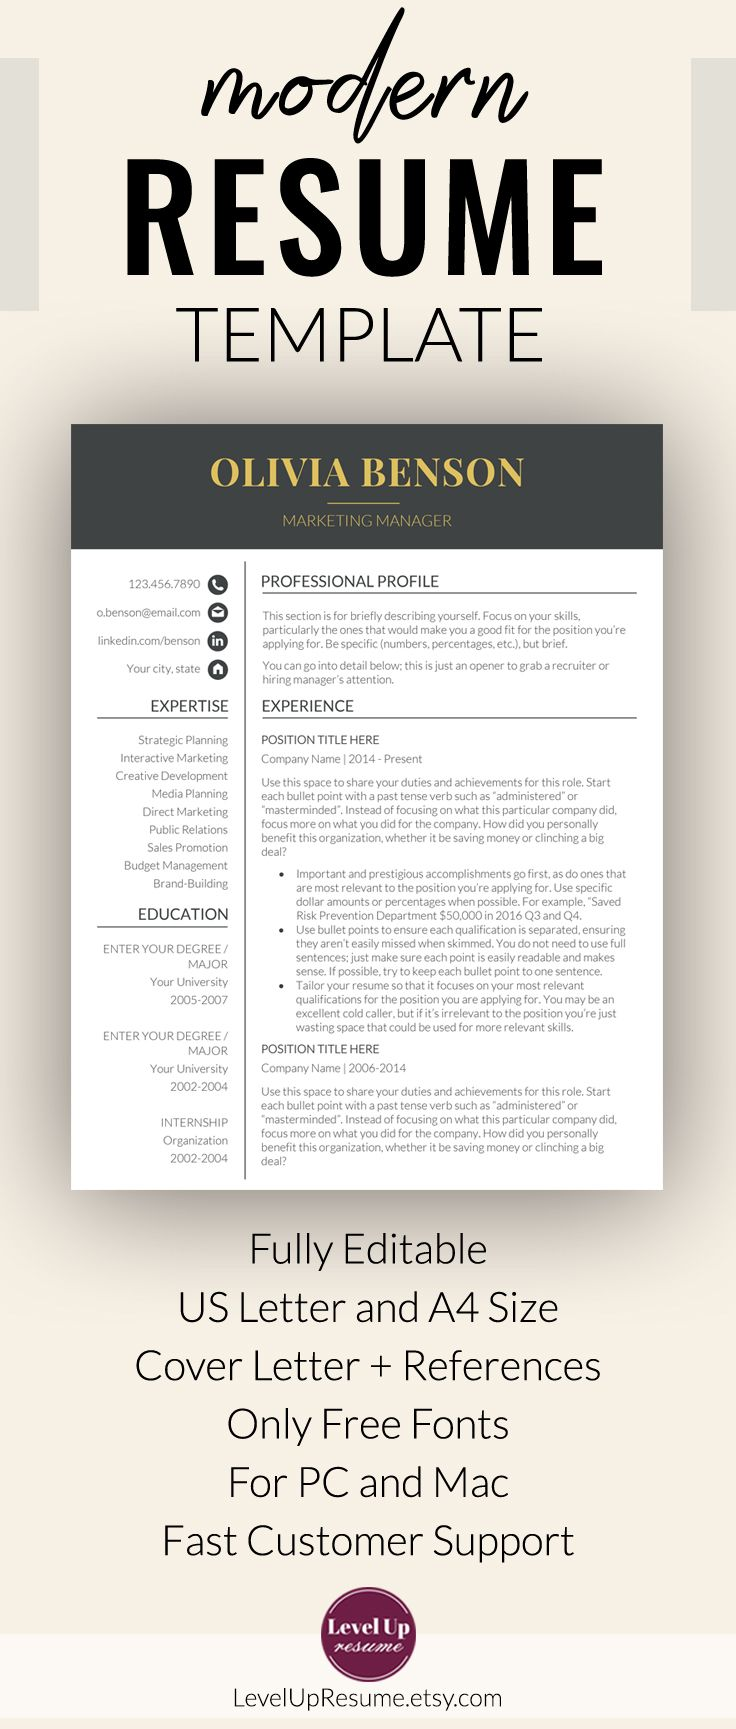 Die besten 25+ Resume examples for jobs Ideen auf Pinterest ...